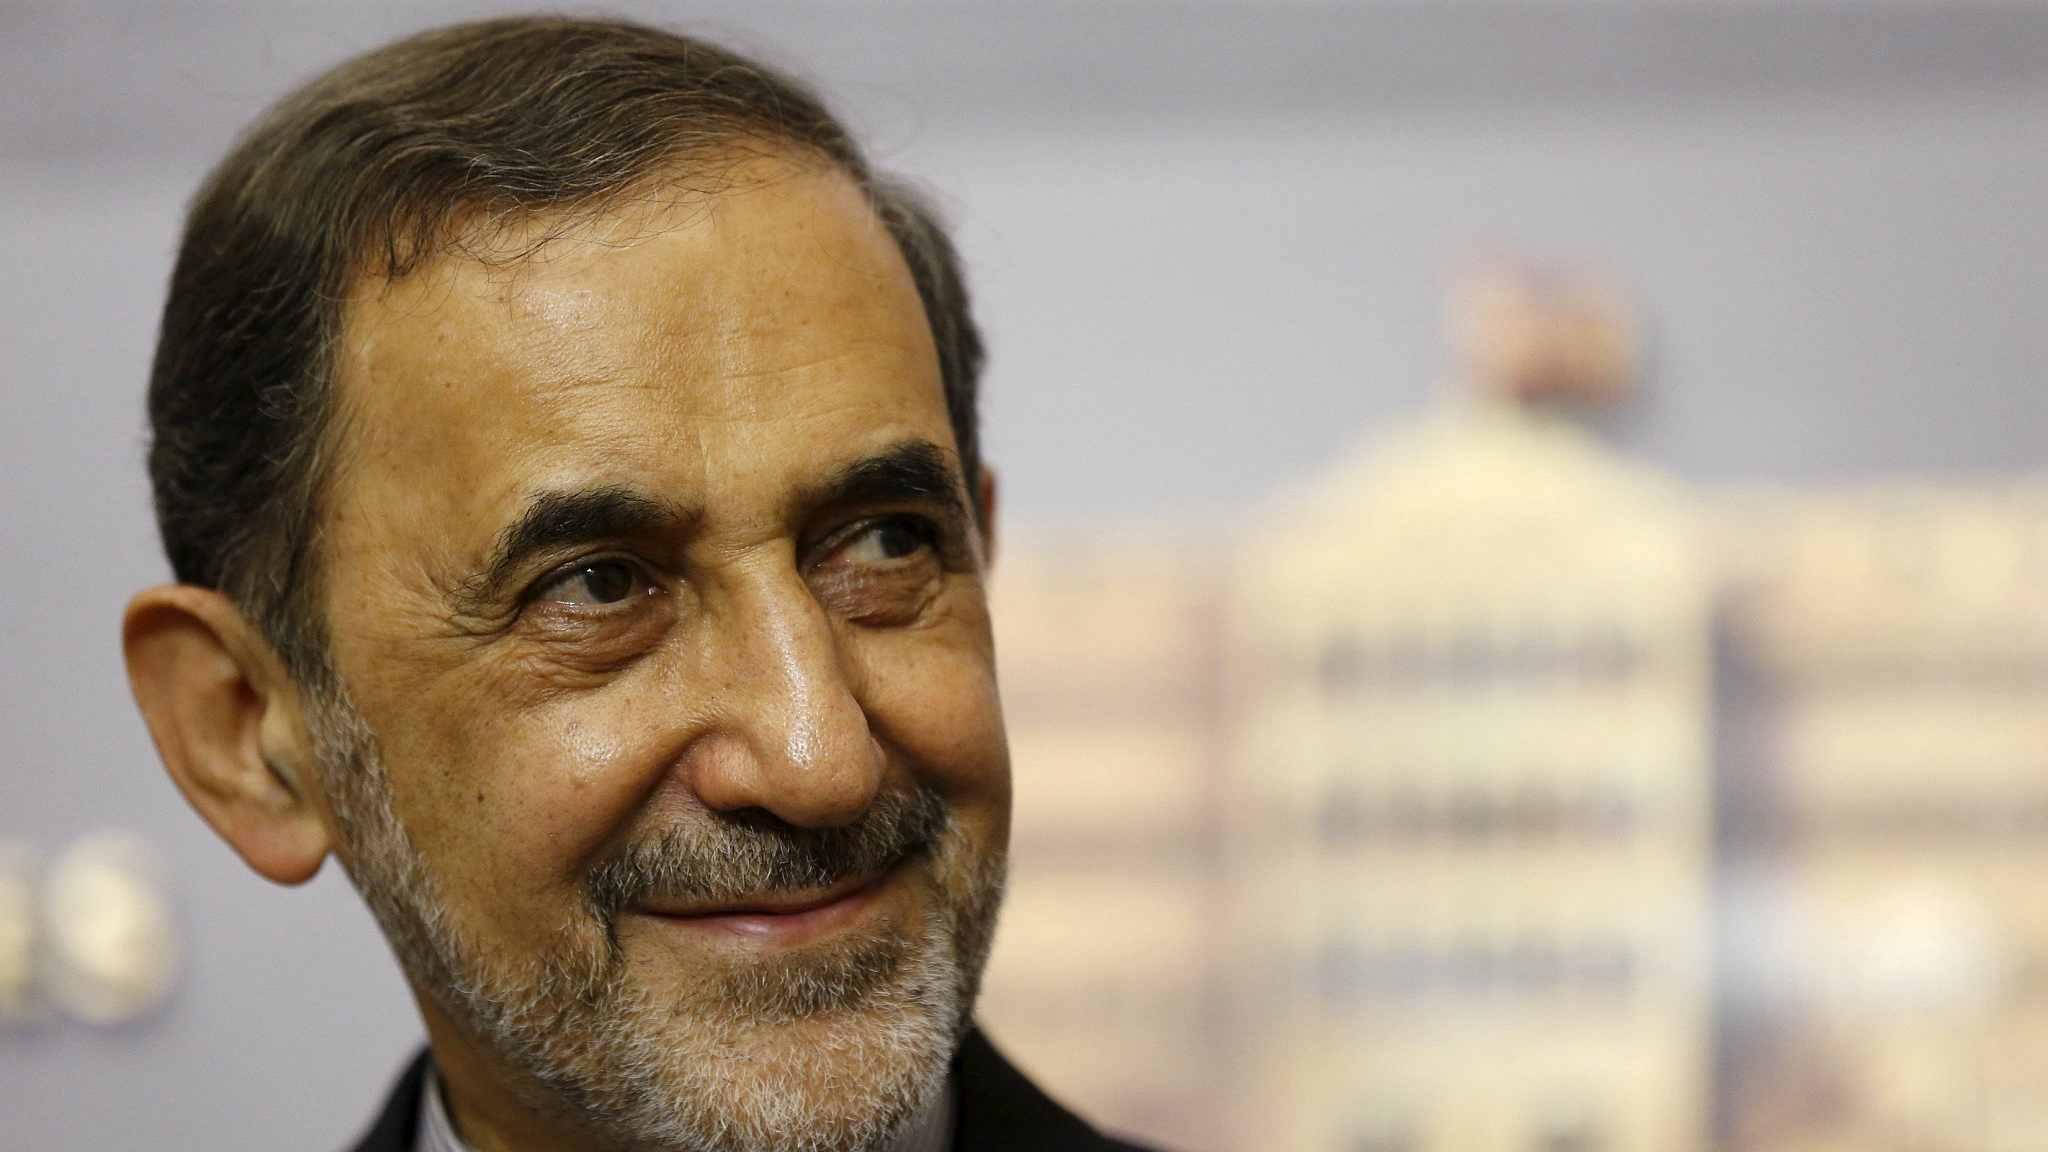 Iran top aide dismisses US meeting offer as 'Trump's dream'